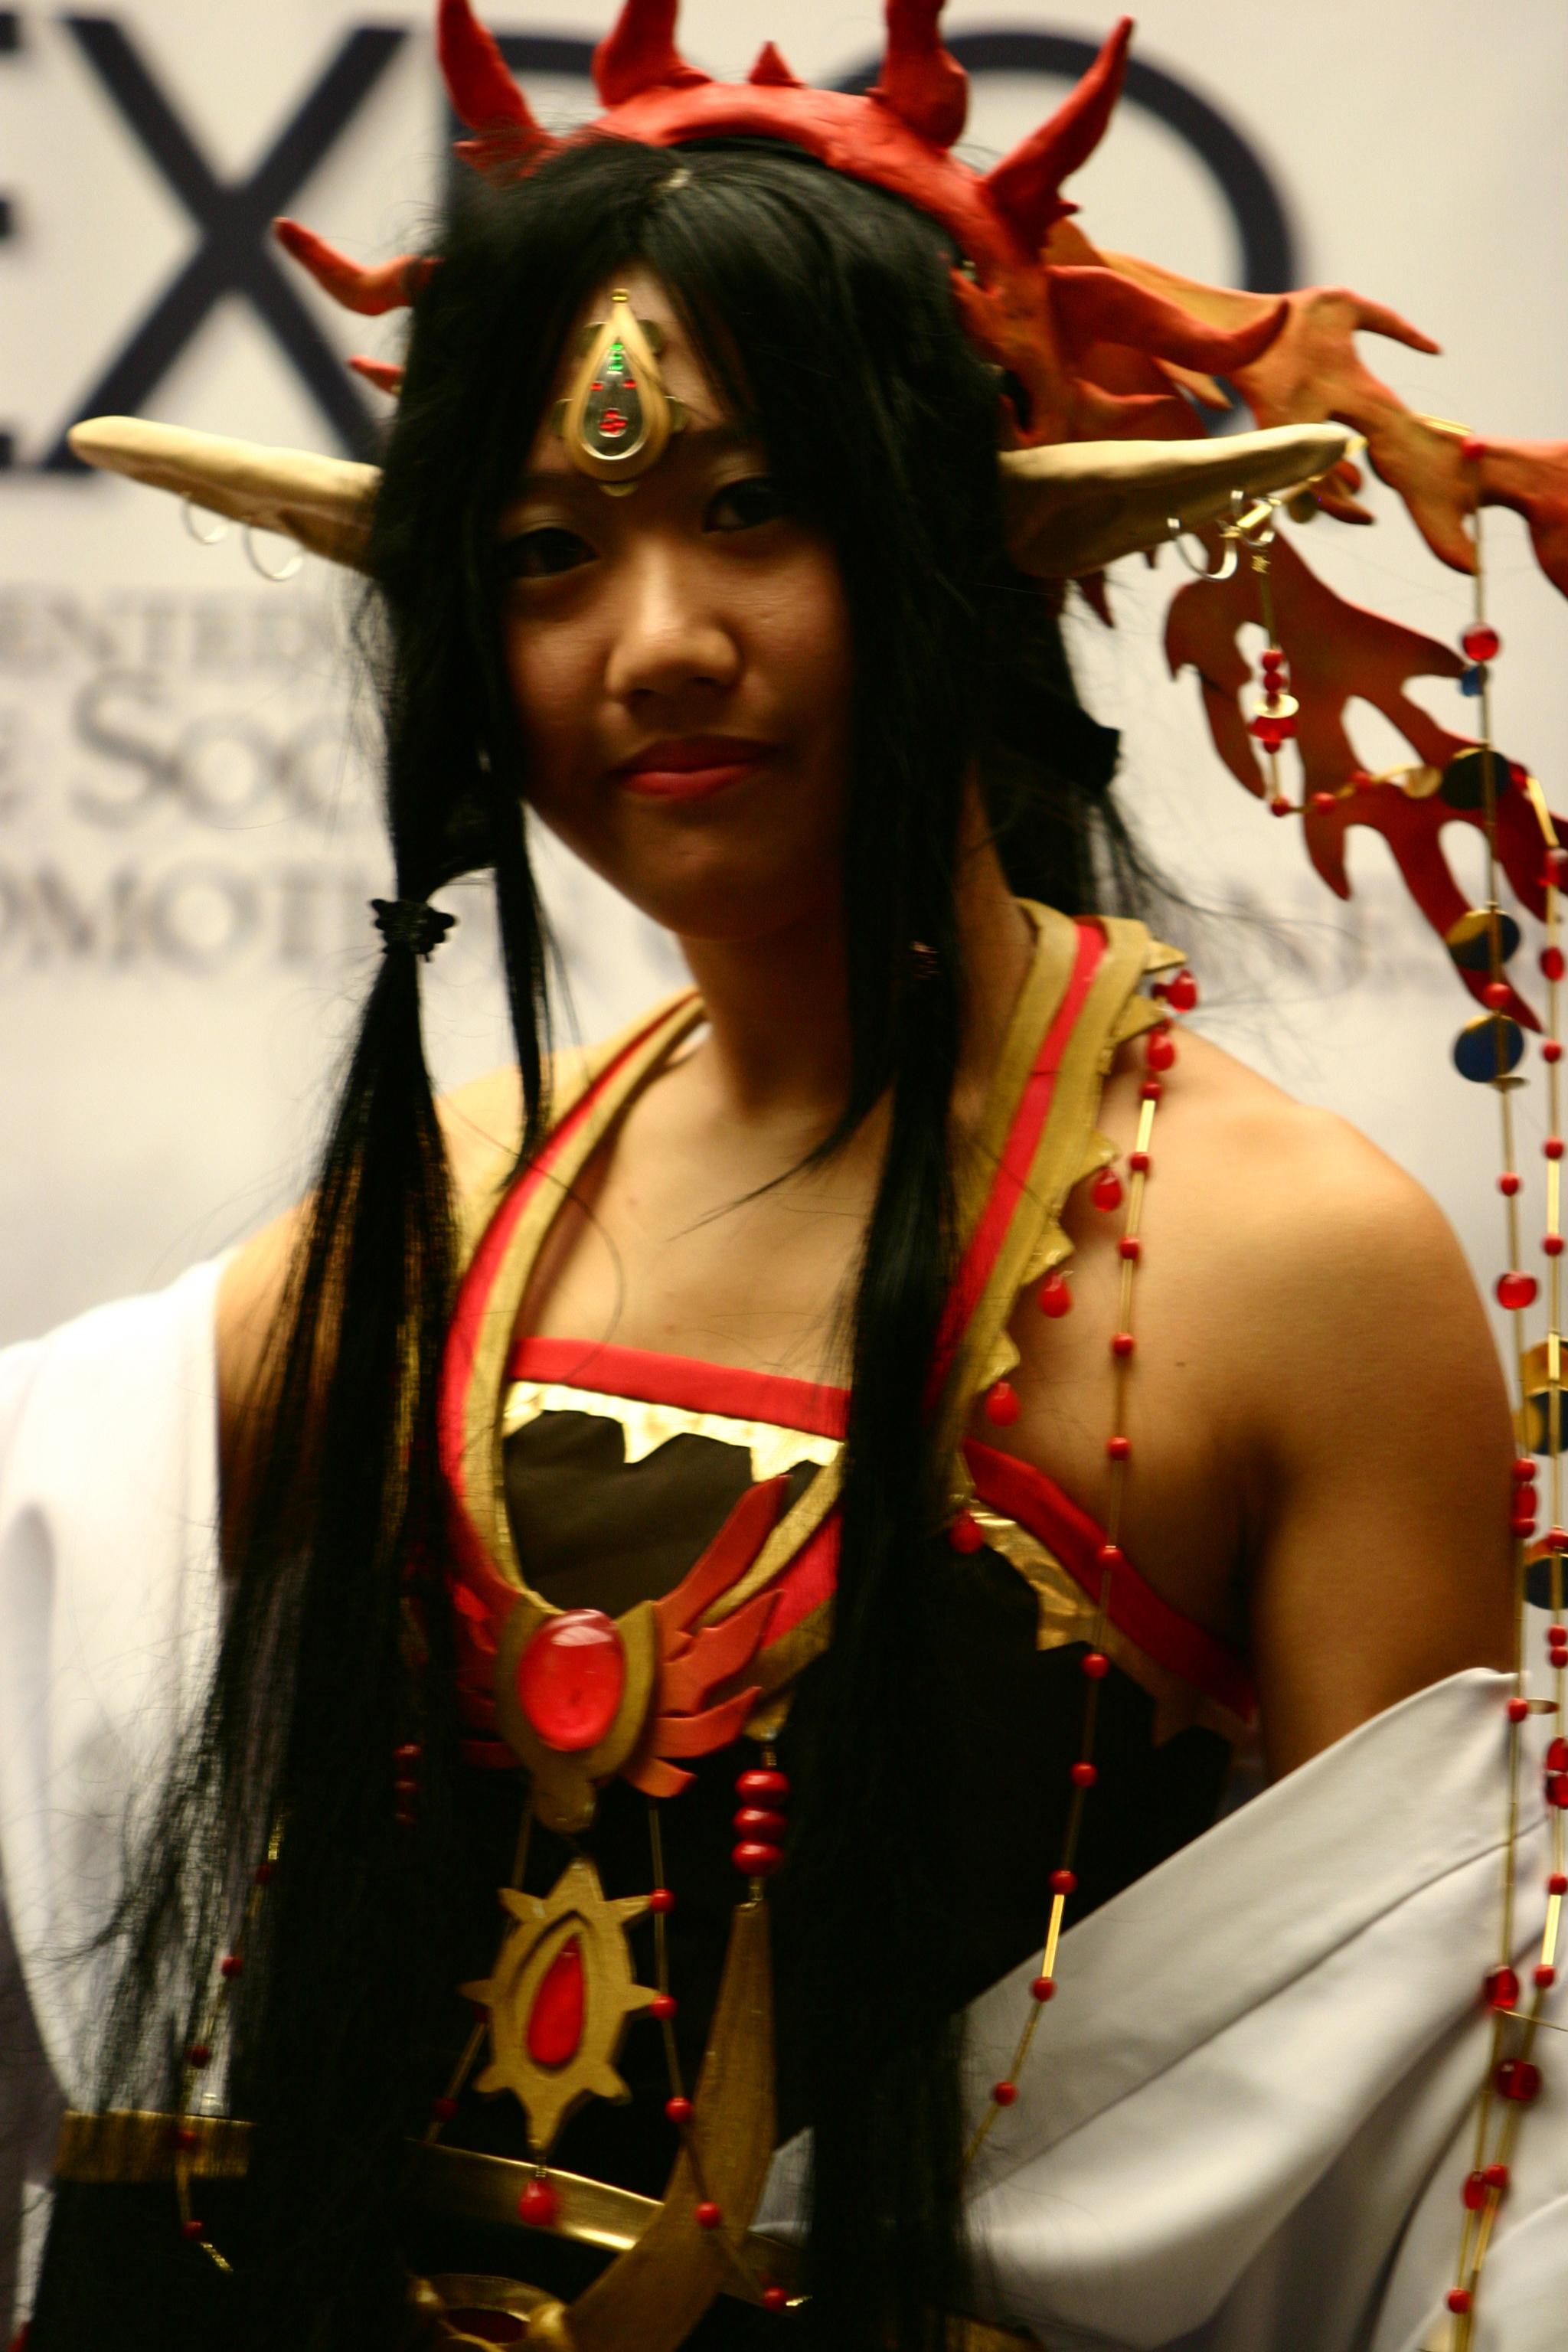 AX_2006_Masquerade_240.JPG